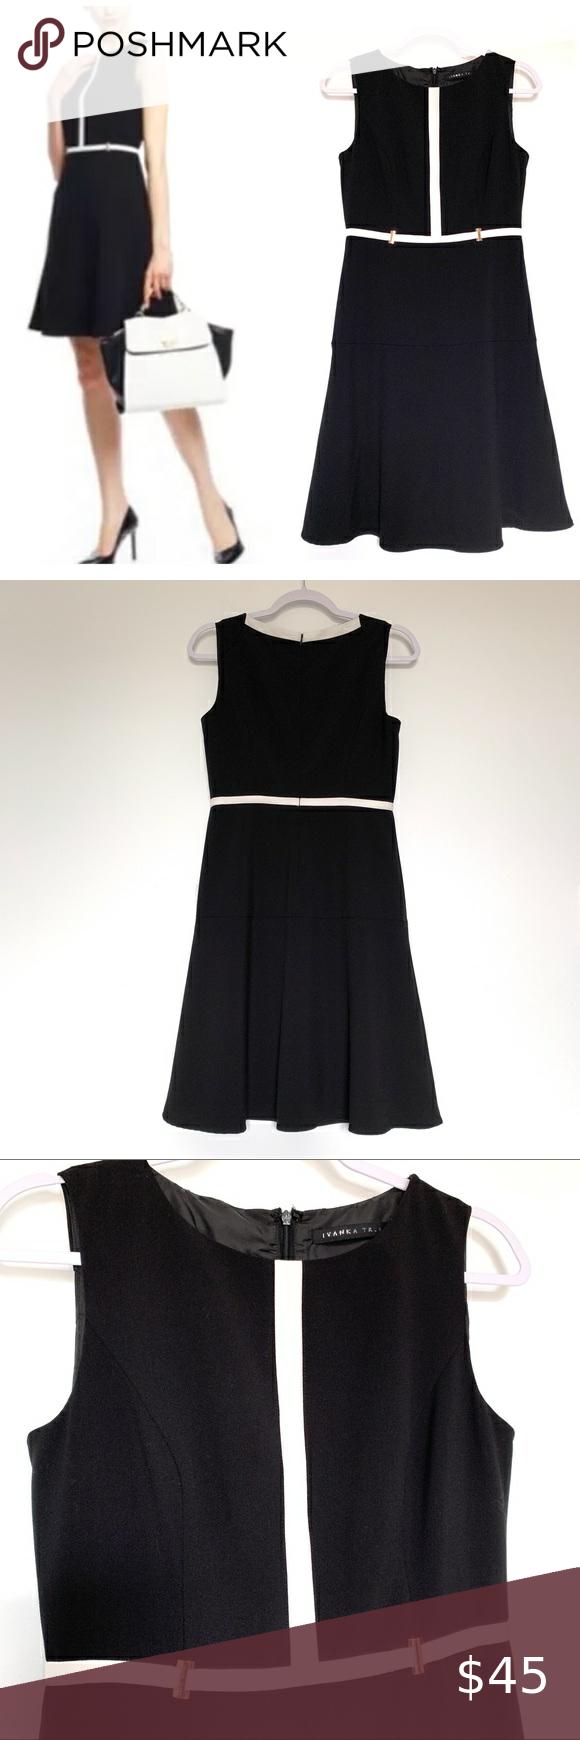 Ivanka Trump Black Dress With White Trim Size 2 Black Dress White Trim Dresses [ 1740 x 580 Pixel ]